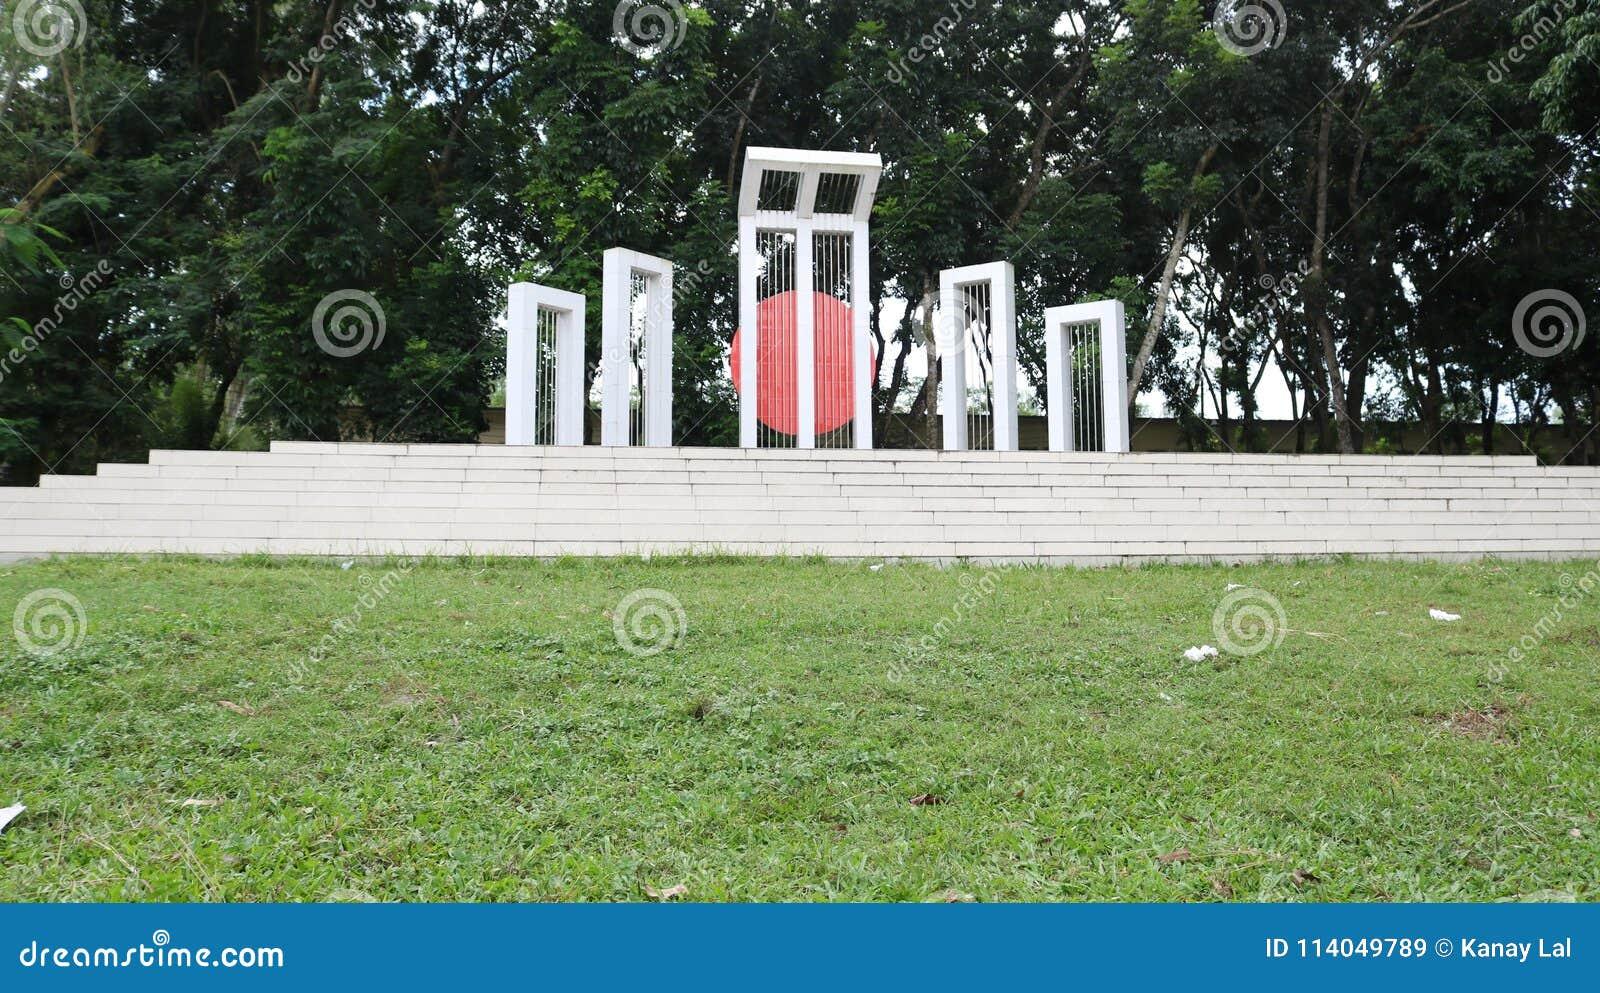 Am 1. Februar 1952 gedenkt das Shaheed Minar am 21. Februar Carmichael-College Rangpur